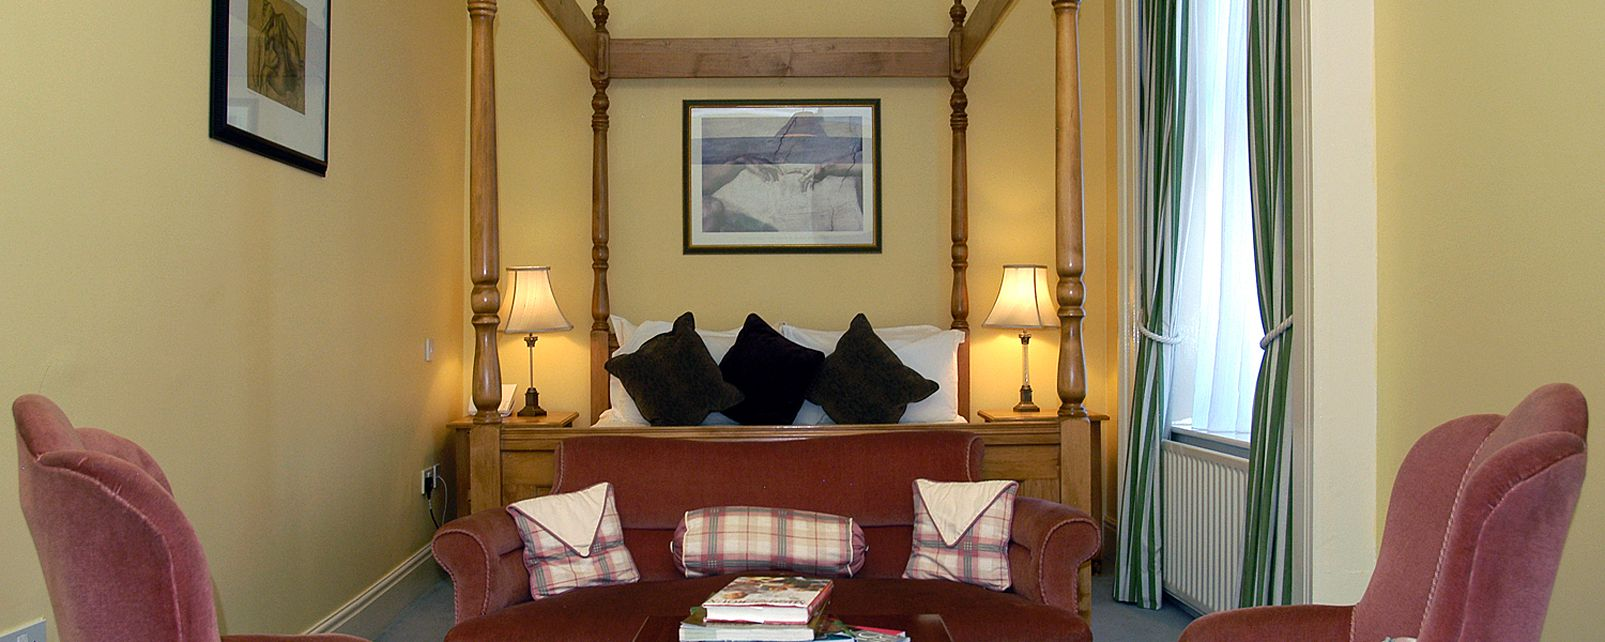 Hotel Aberdeen Lodge Hotel